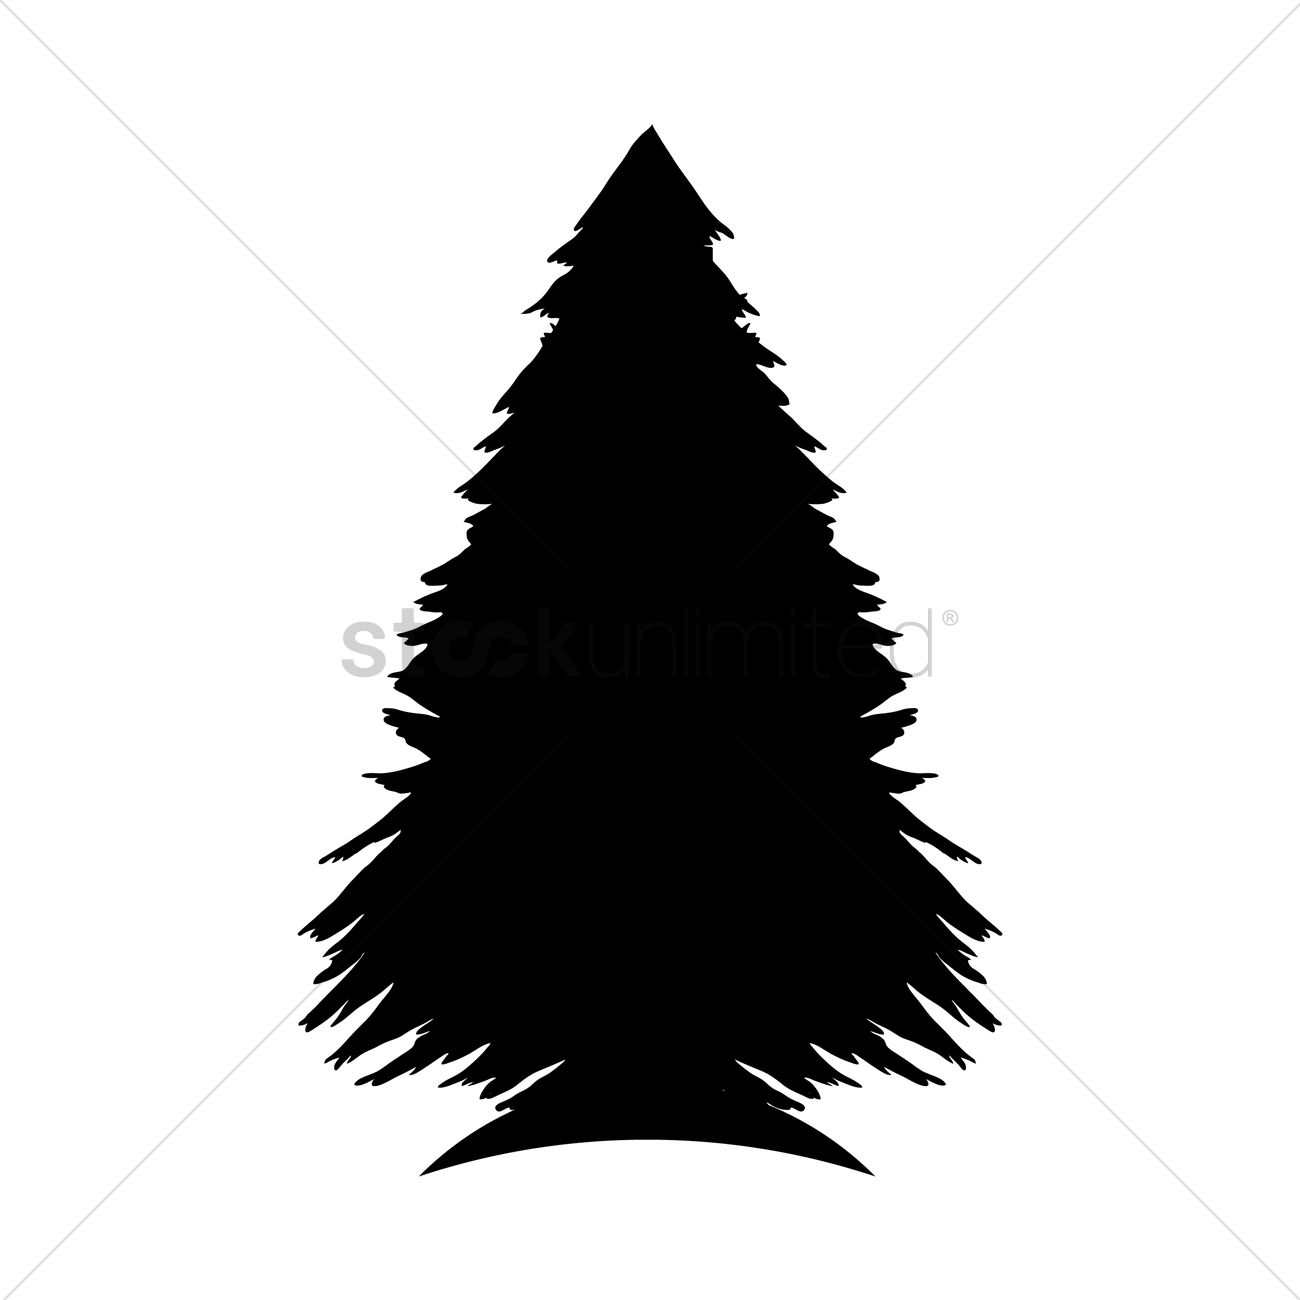 pine tree silhouette vector image 1903000 stockunlimited rh stockunlimited com pine tree graphic images pine tree graphics free